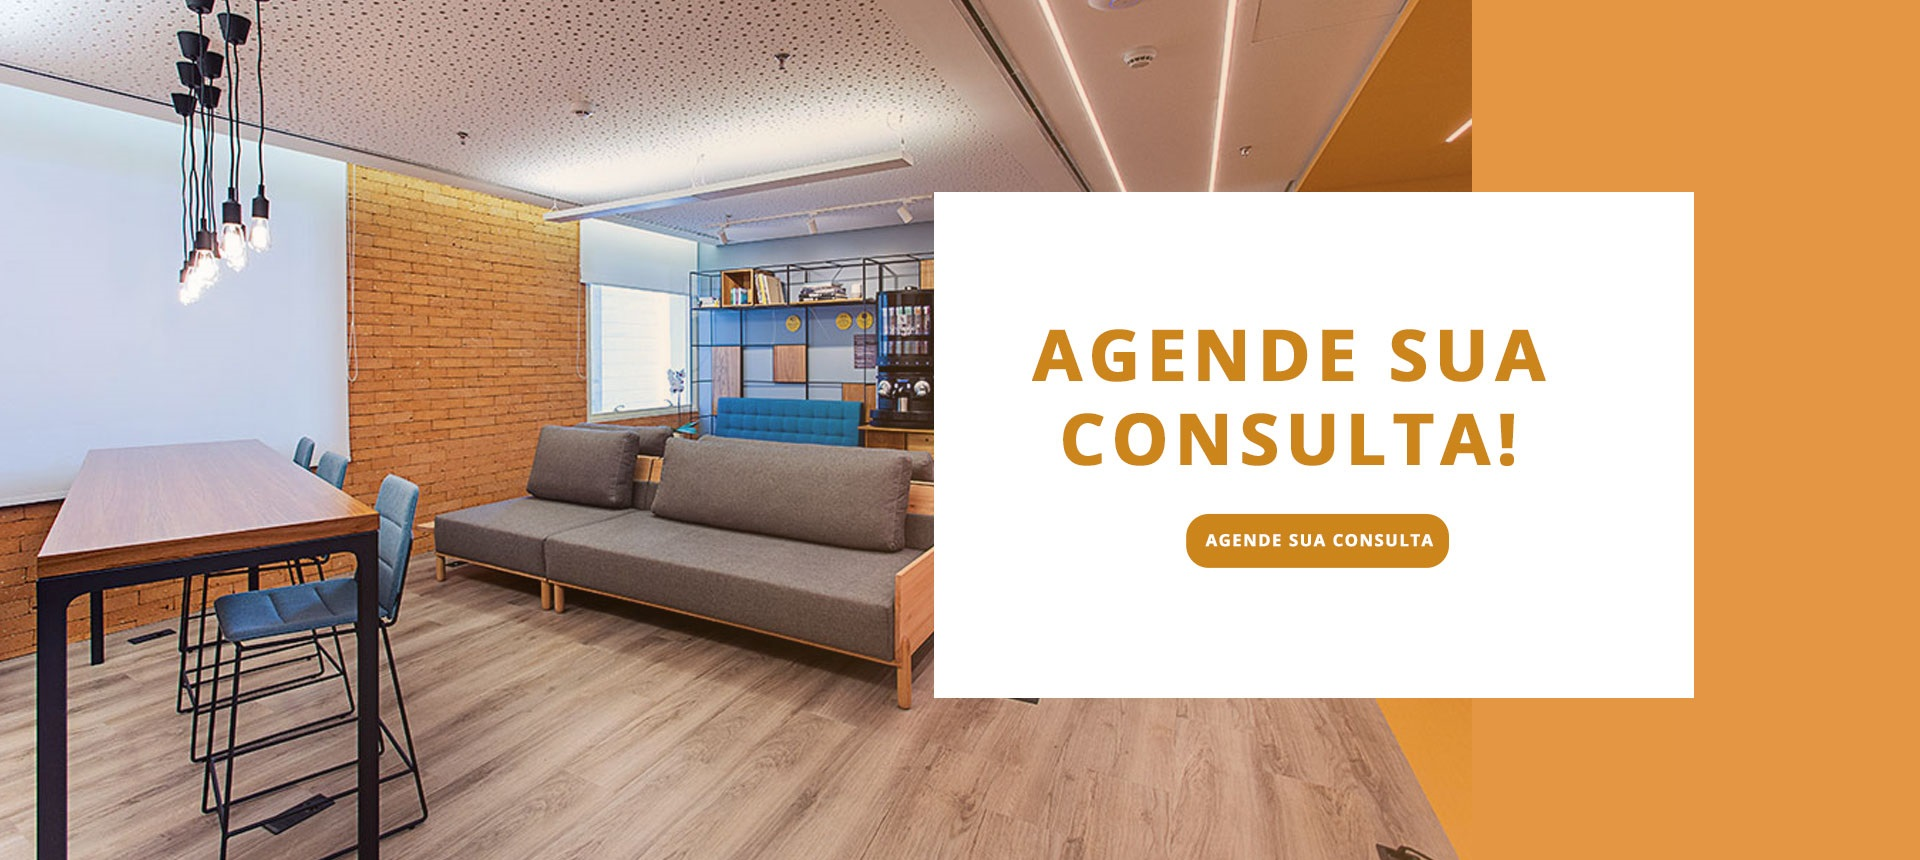 Agende sua consulta | Dr. Arthur Vicentini CRM 154.086